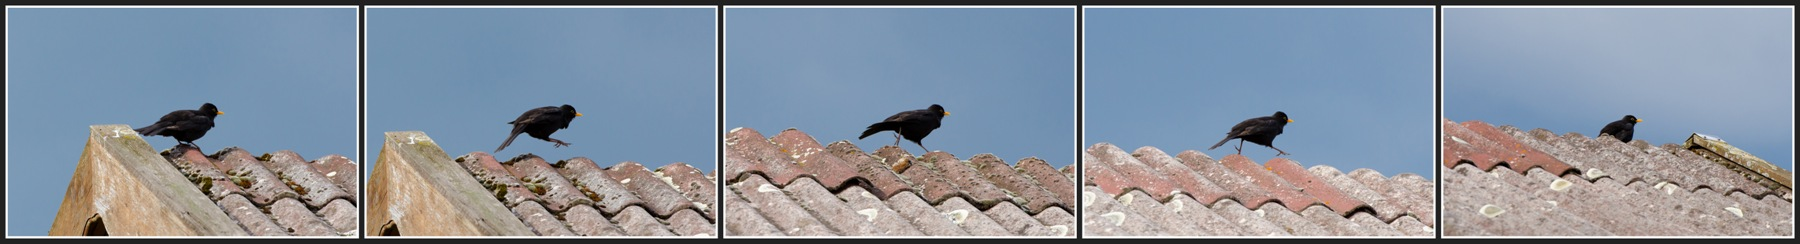 Walking on Roof